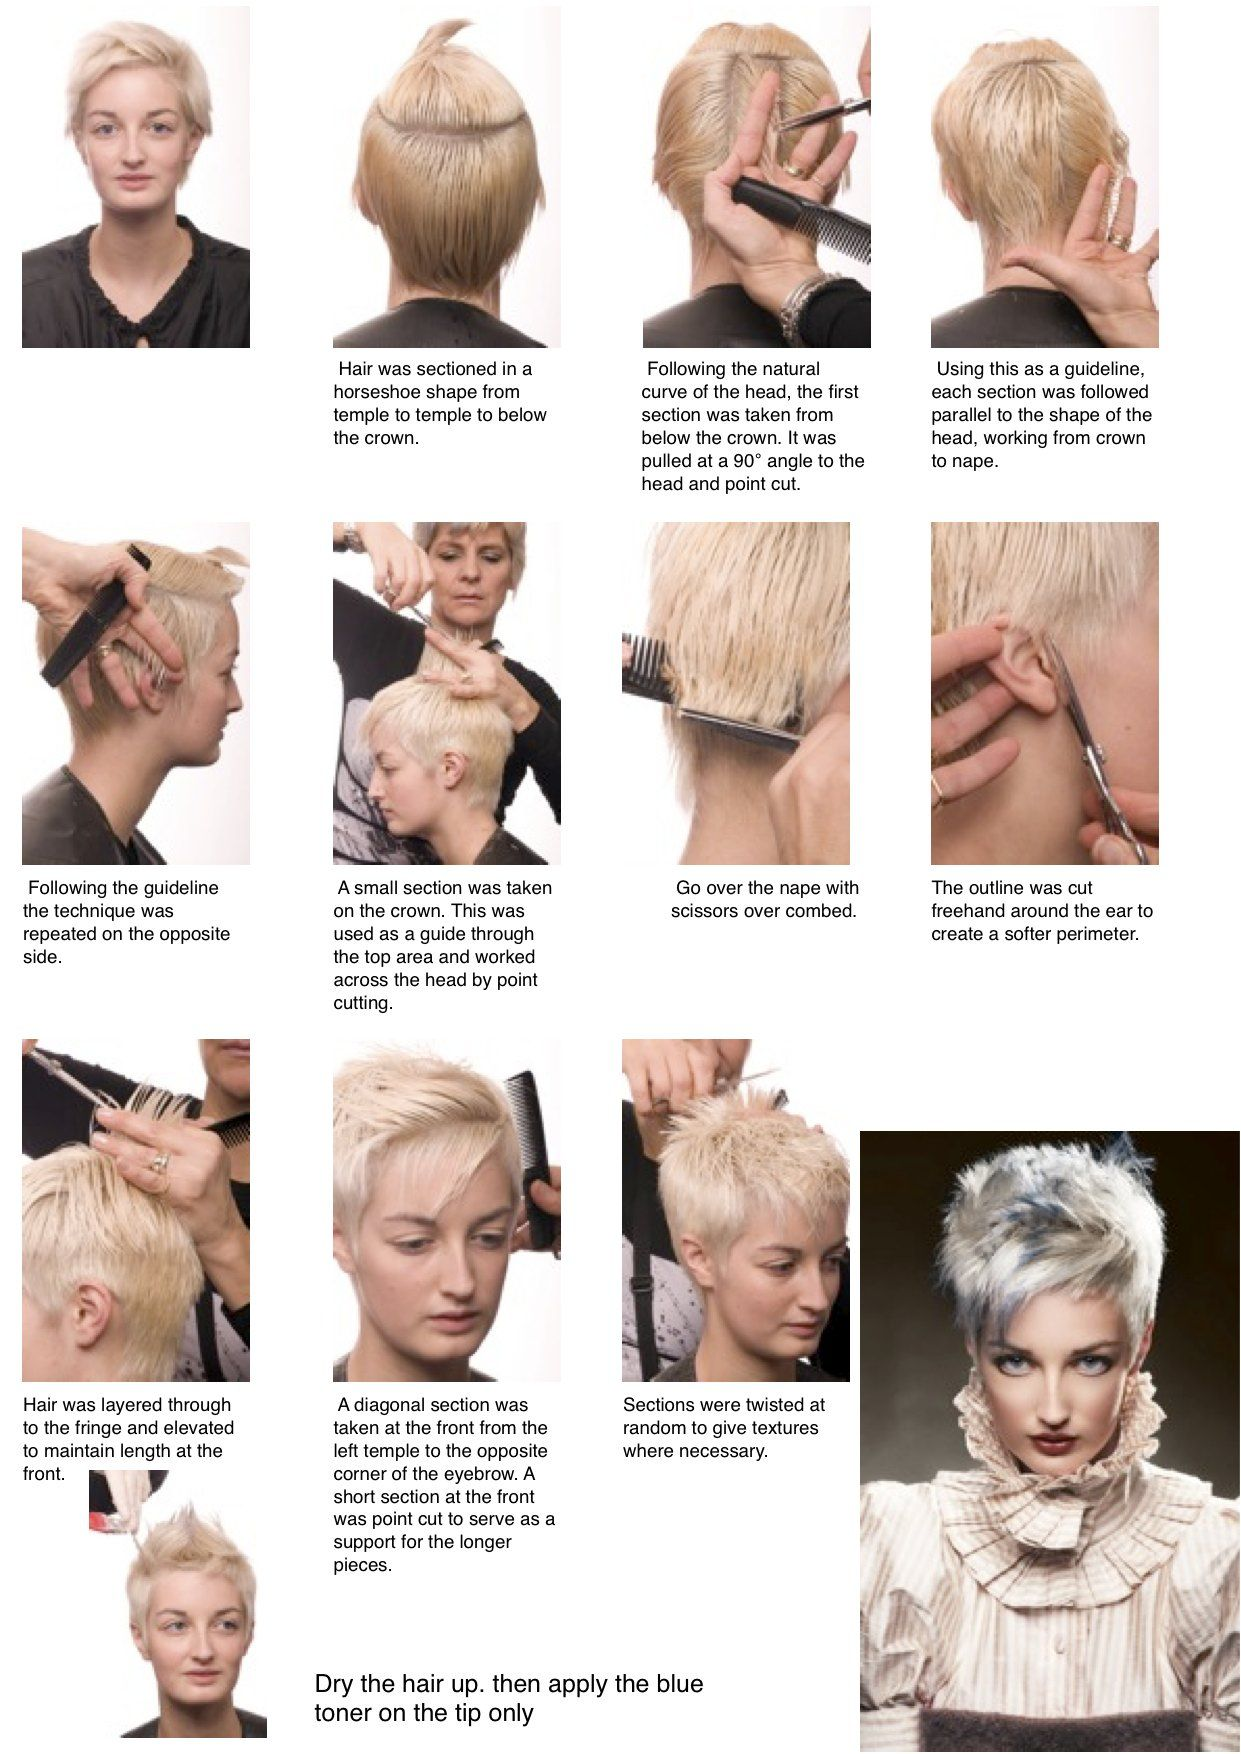 Mens haircut diagram great use of toners hair by anne veck  hair  pinterest  haircuts